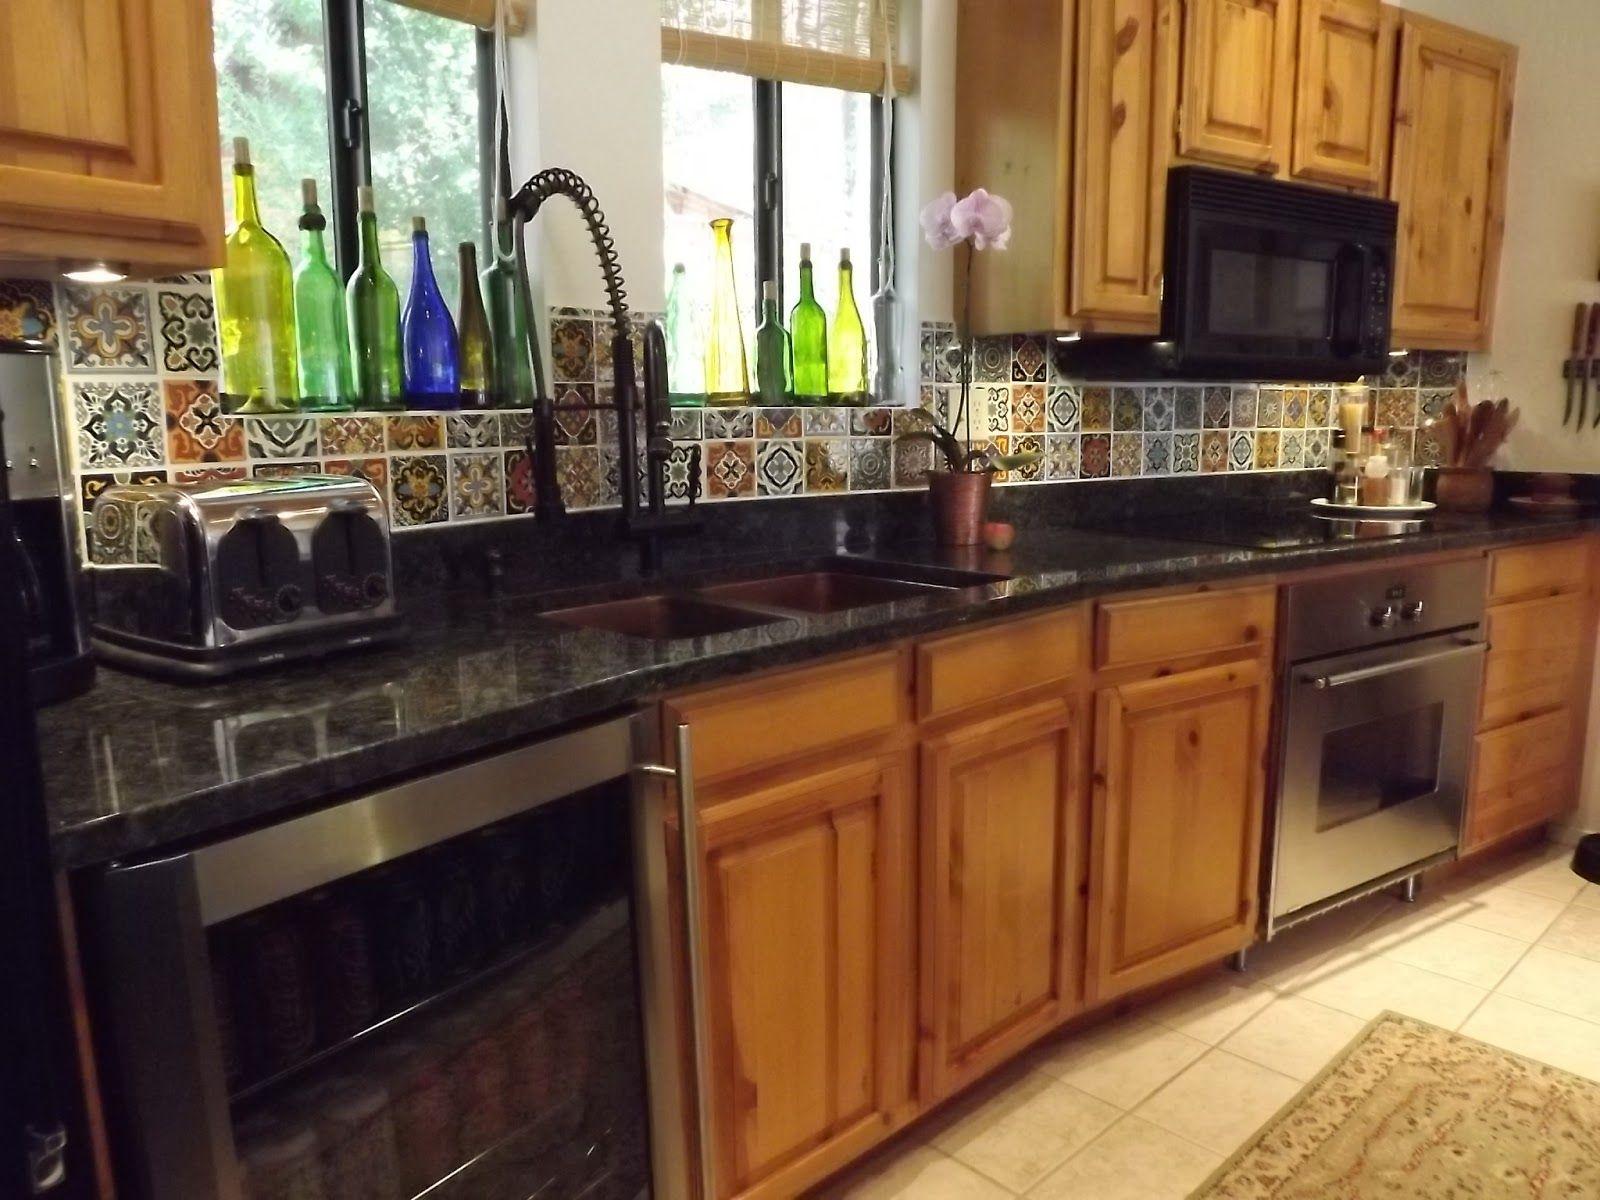 Mexican Tile Kitchen Backsplash DIY | Mexican tile kitchen ...